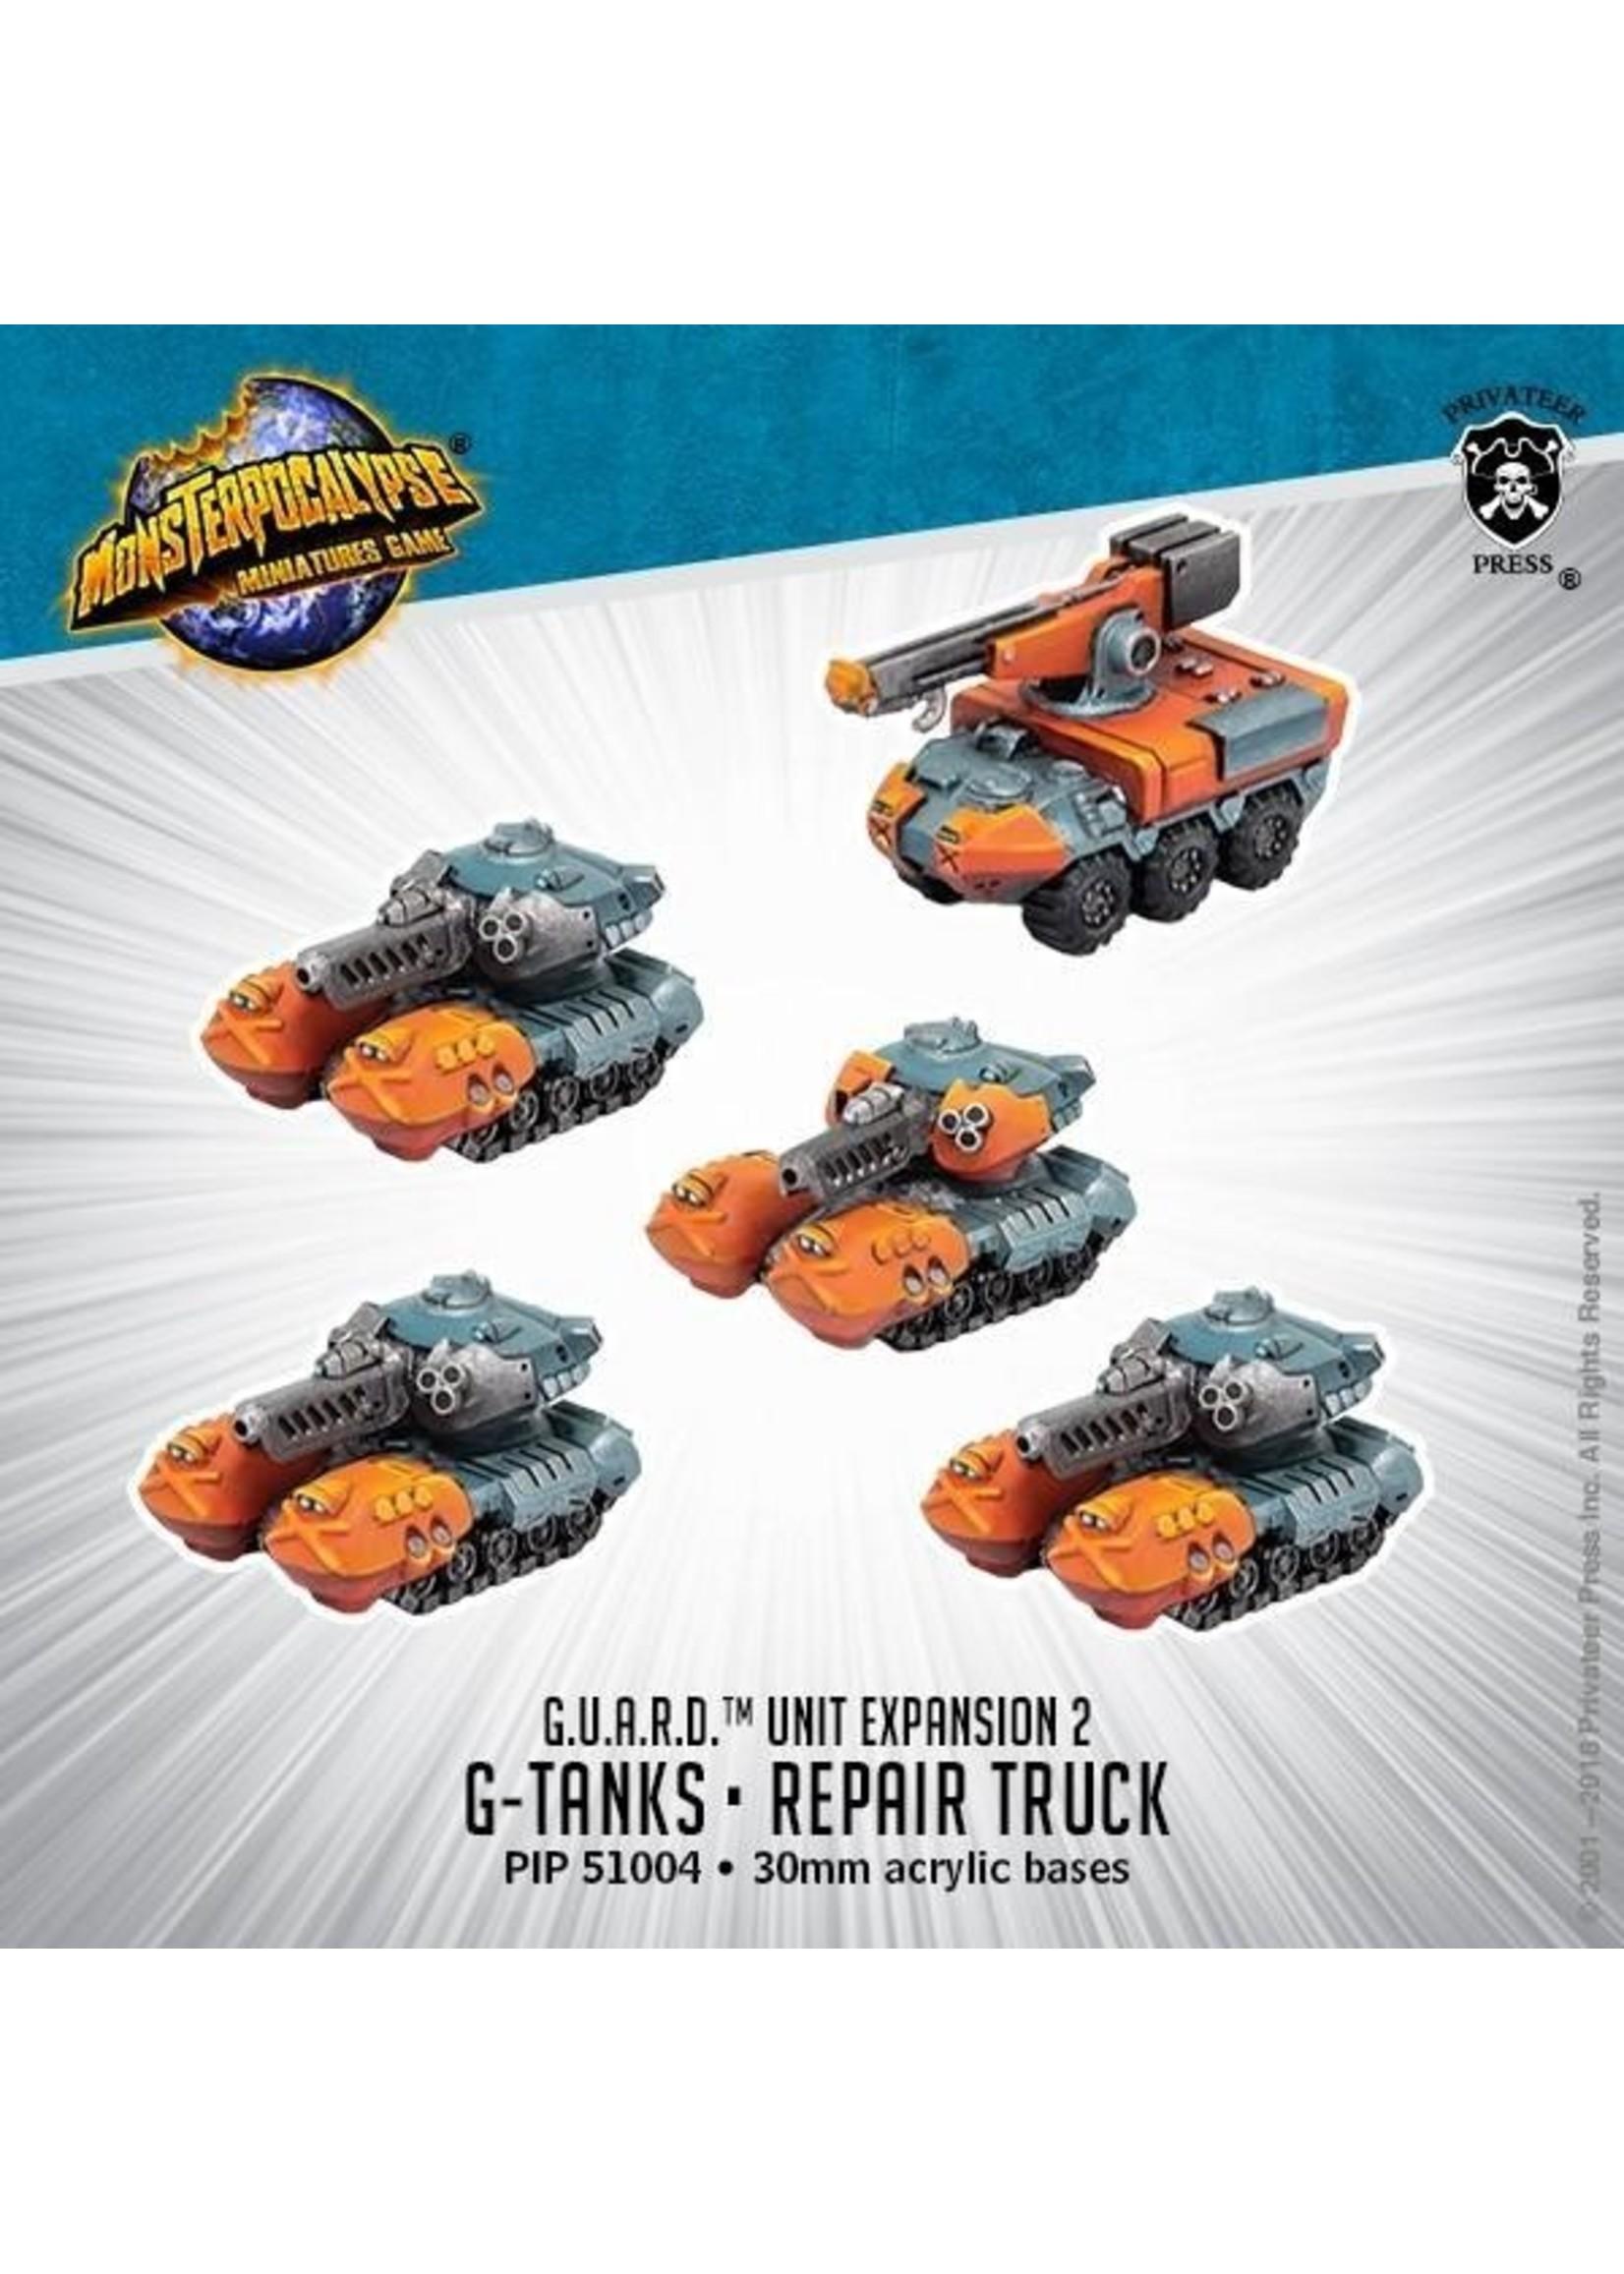 Monsterpocalypse: G.U.A.R.D. G-Tanks & Repair Truck Unit (Resin)